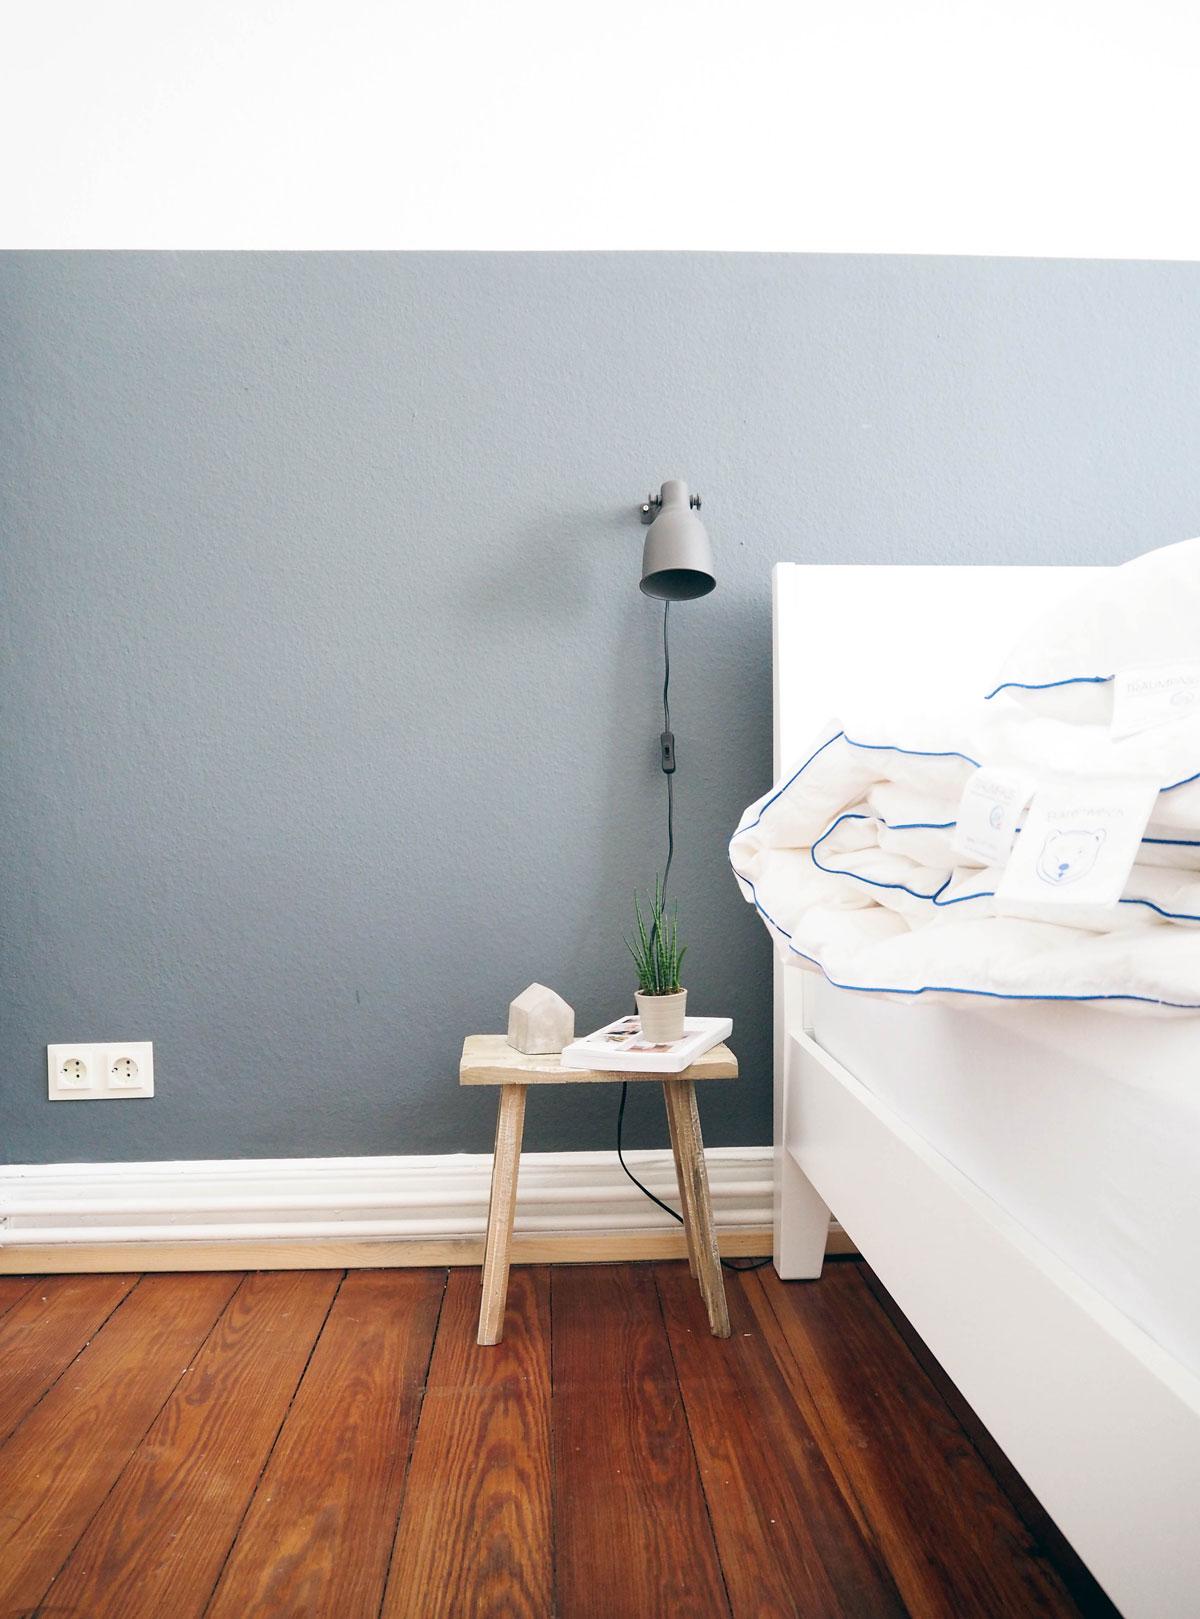 20170525-Lieblings-Blog-Nachttisch-alte-Holzbank-Half-Painted-Wall-Schlafzimmer-Inspiration-Bruno-Bett-Bettwäsche-Bärenweich